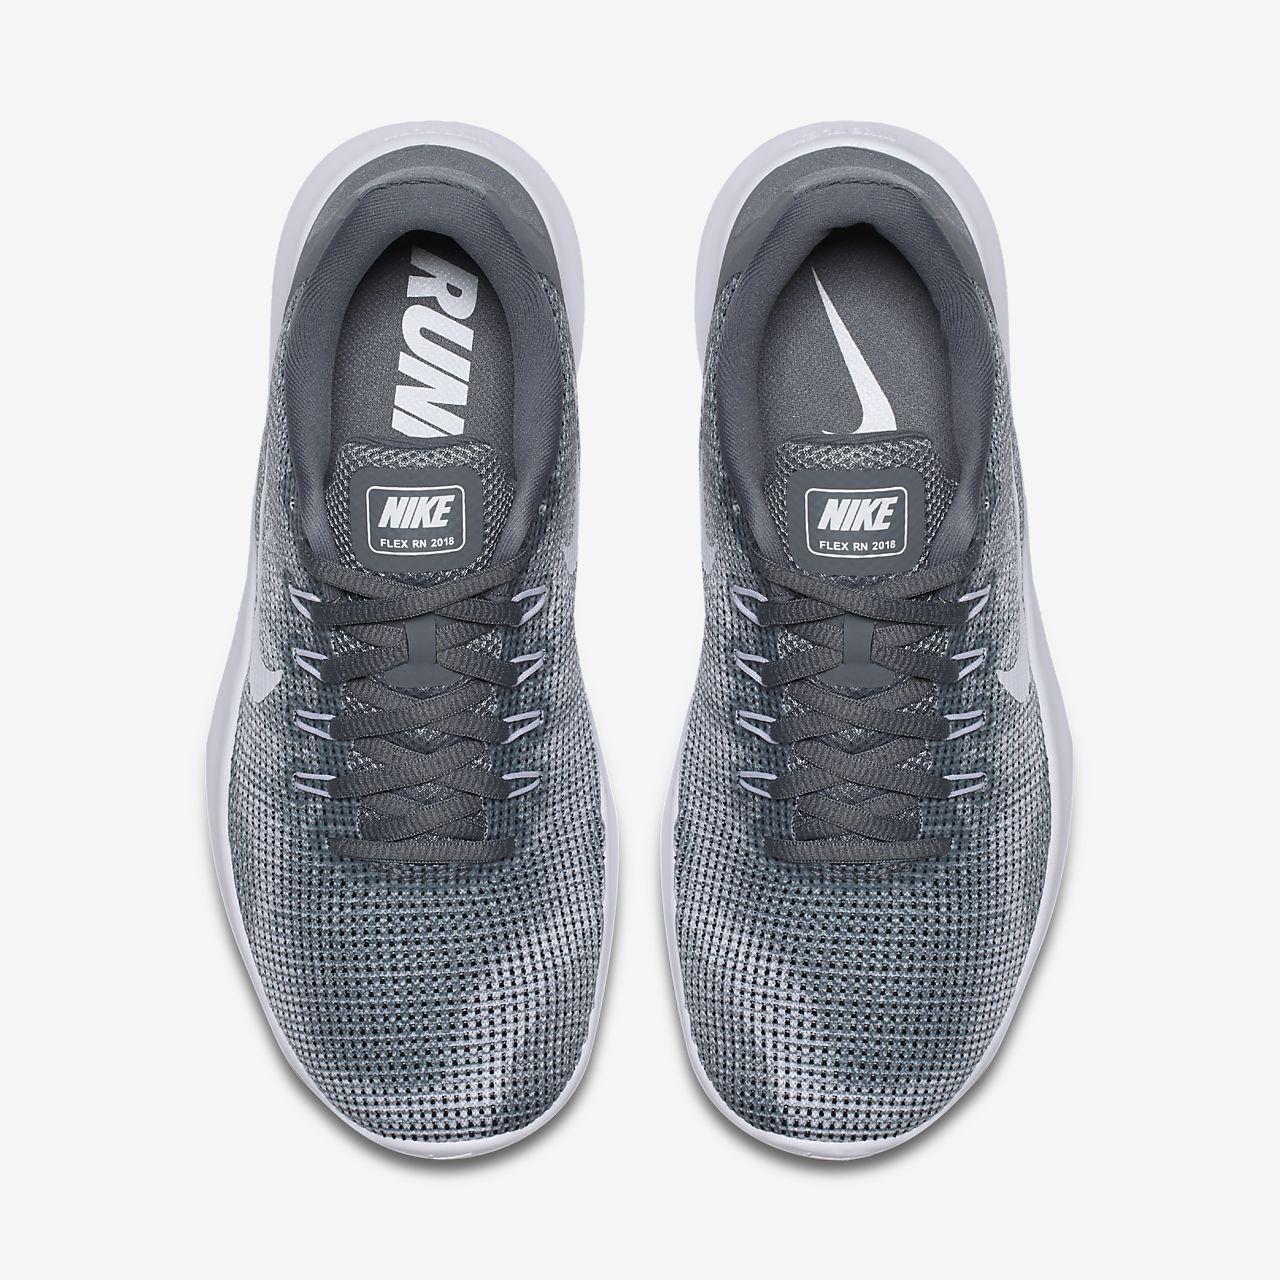 Calzado Rn Mx Mujer Running Para Nike Flex De 2018 rqfBnTr